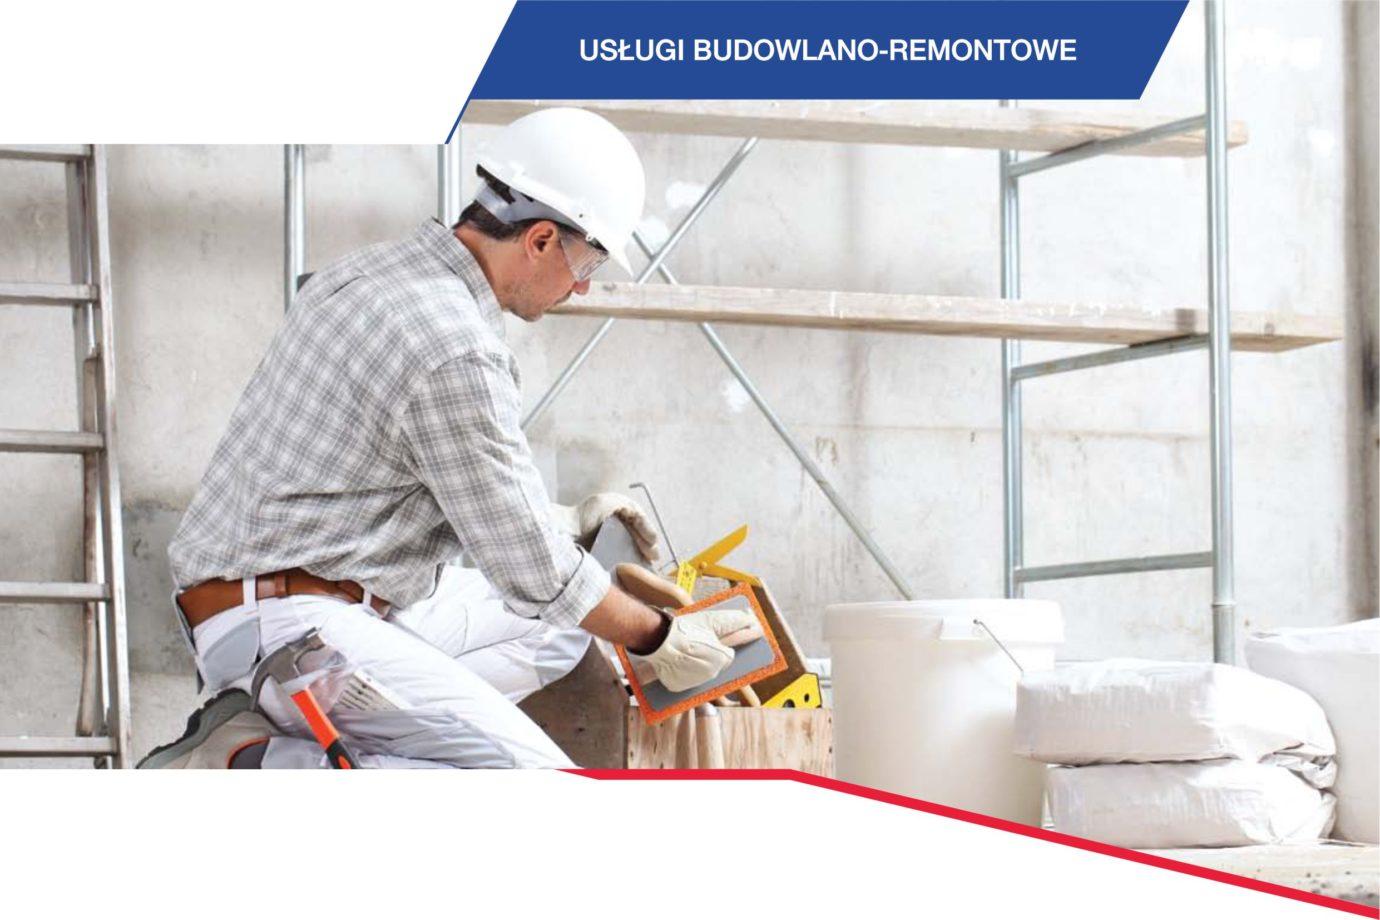 Usługi budowlano-remontowe